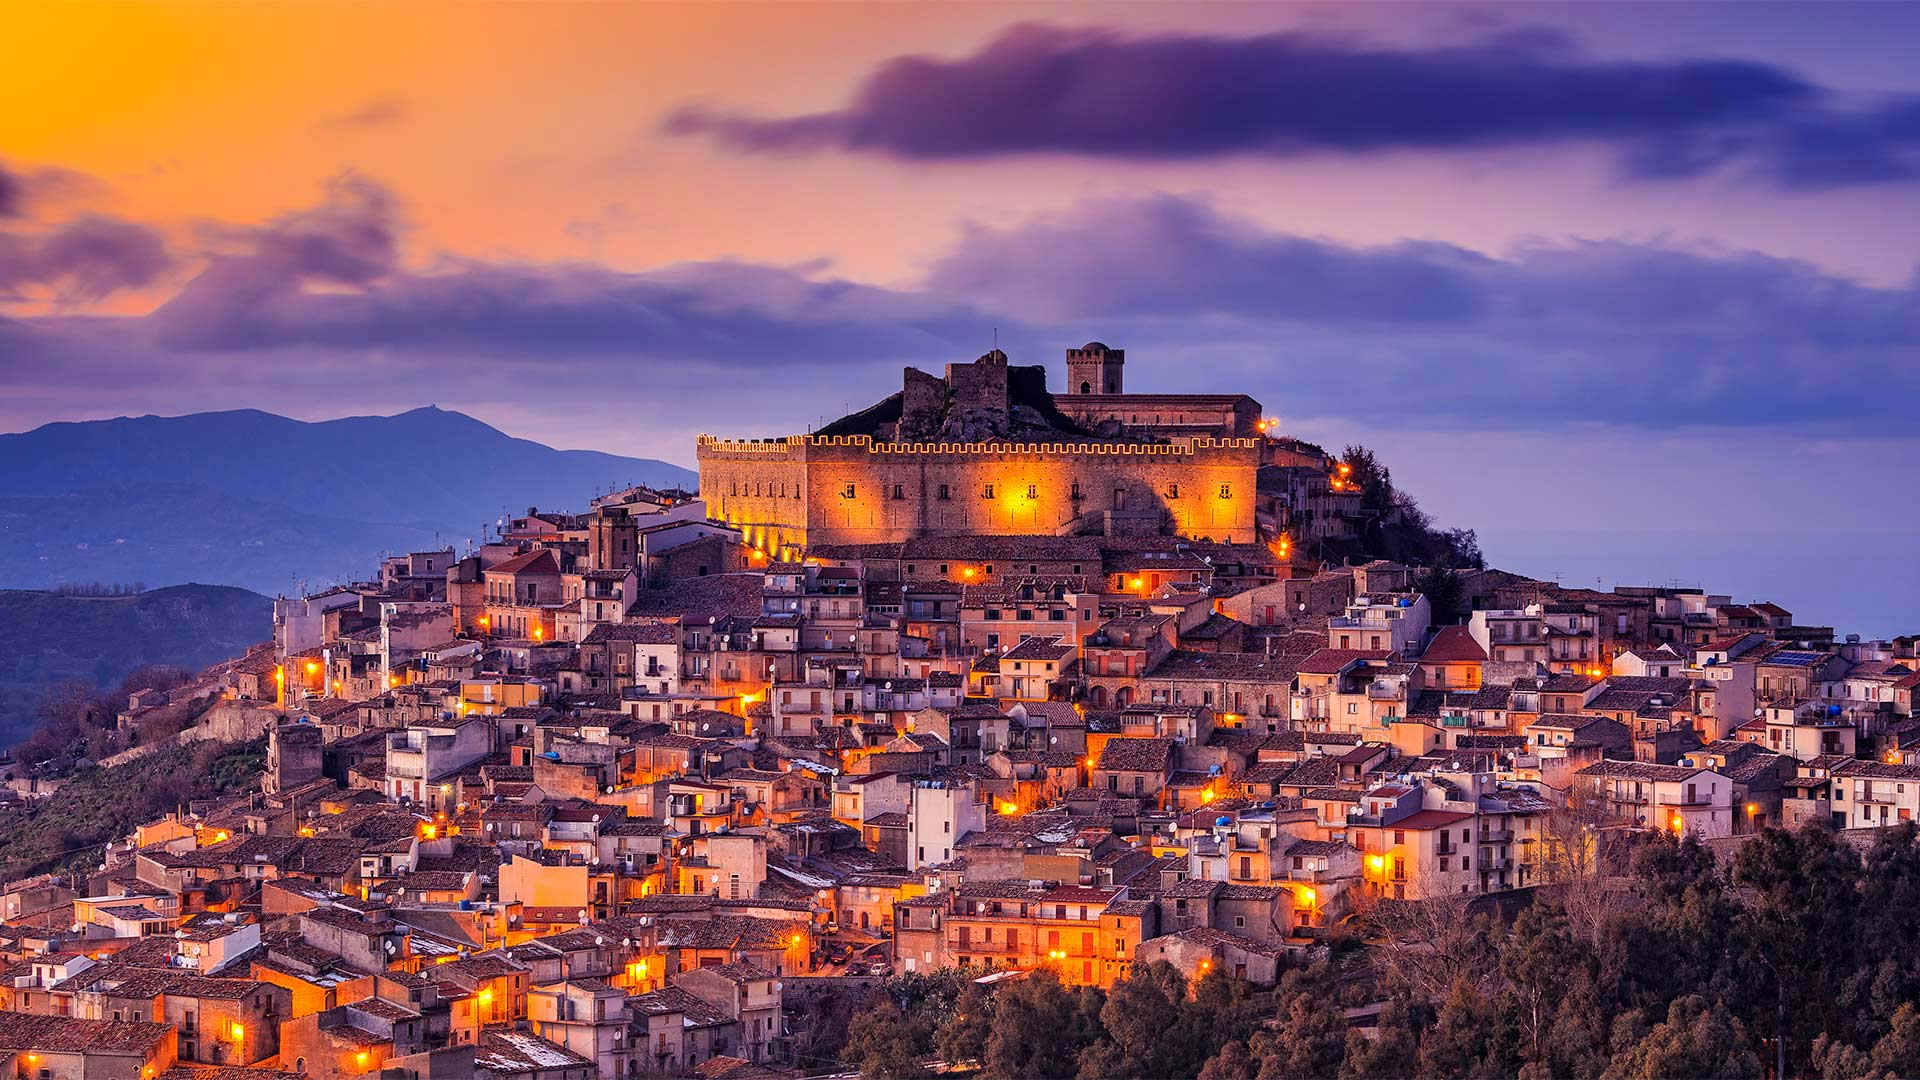 蒙塔尔巴诺埃利科纳,意大利西西里岛 (© Antonino Bartuccio/SOPA Collection/Offset by Shutterstock) - Calf Blog